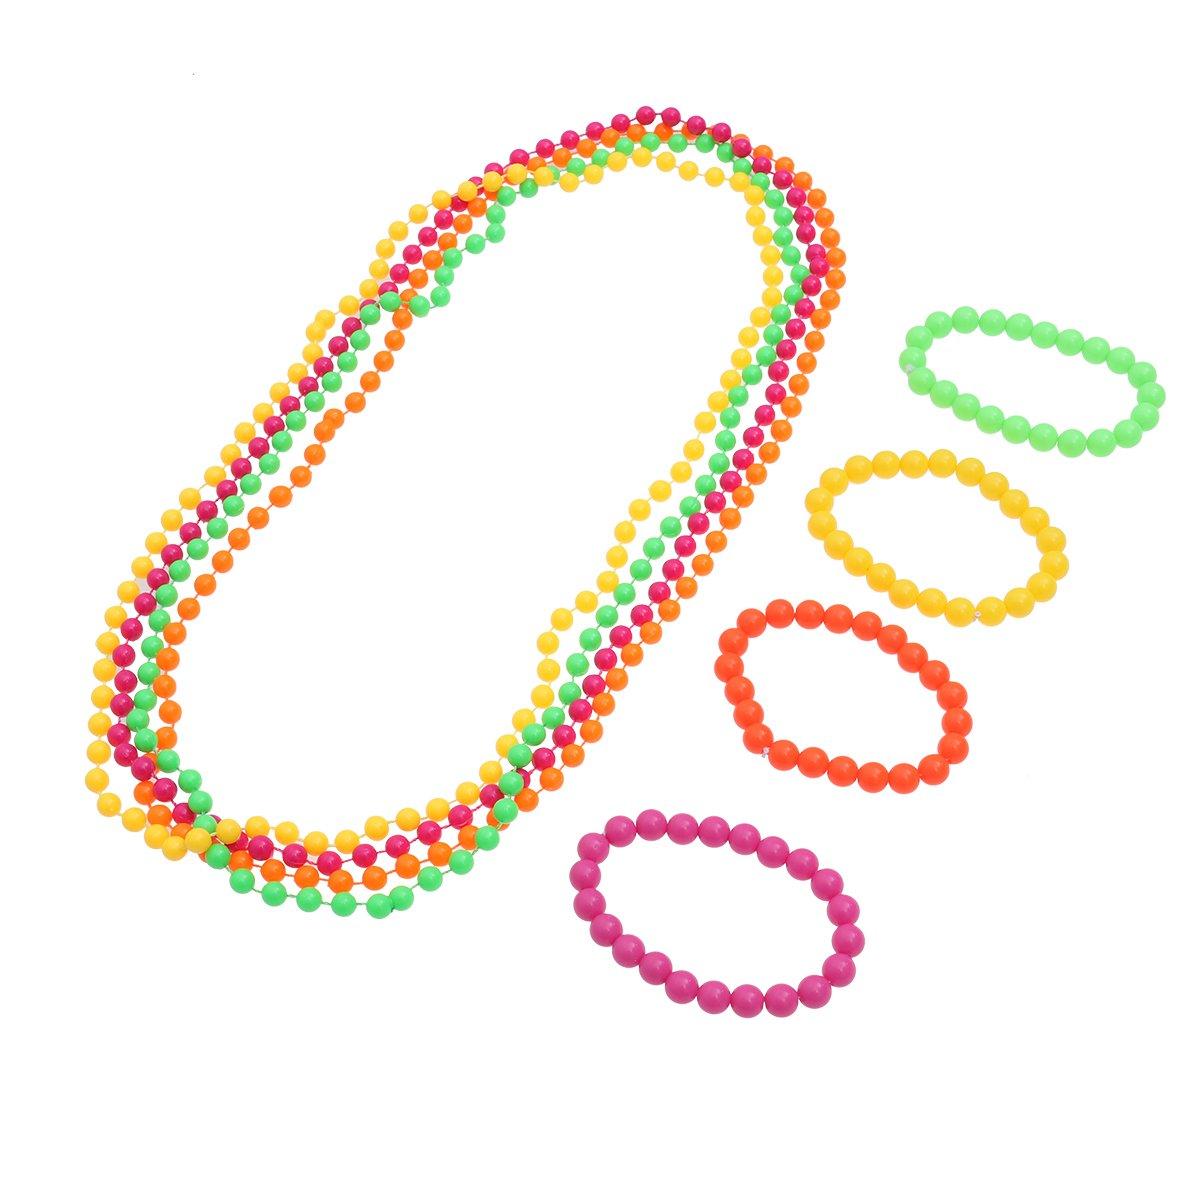 BESTOYARD Neon Bead Halskette Farbe Bead Armband Kostümzubehör